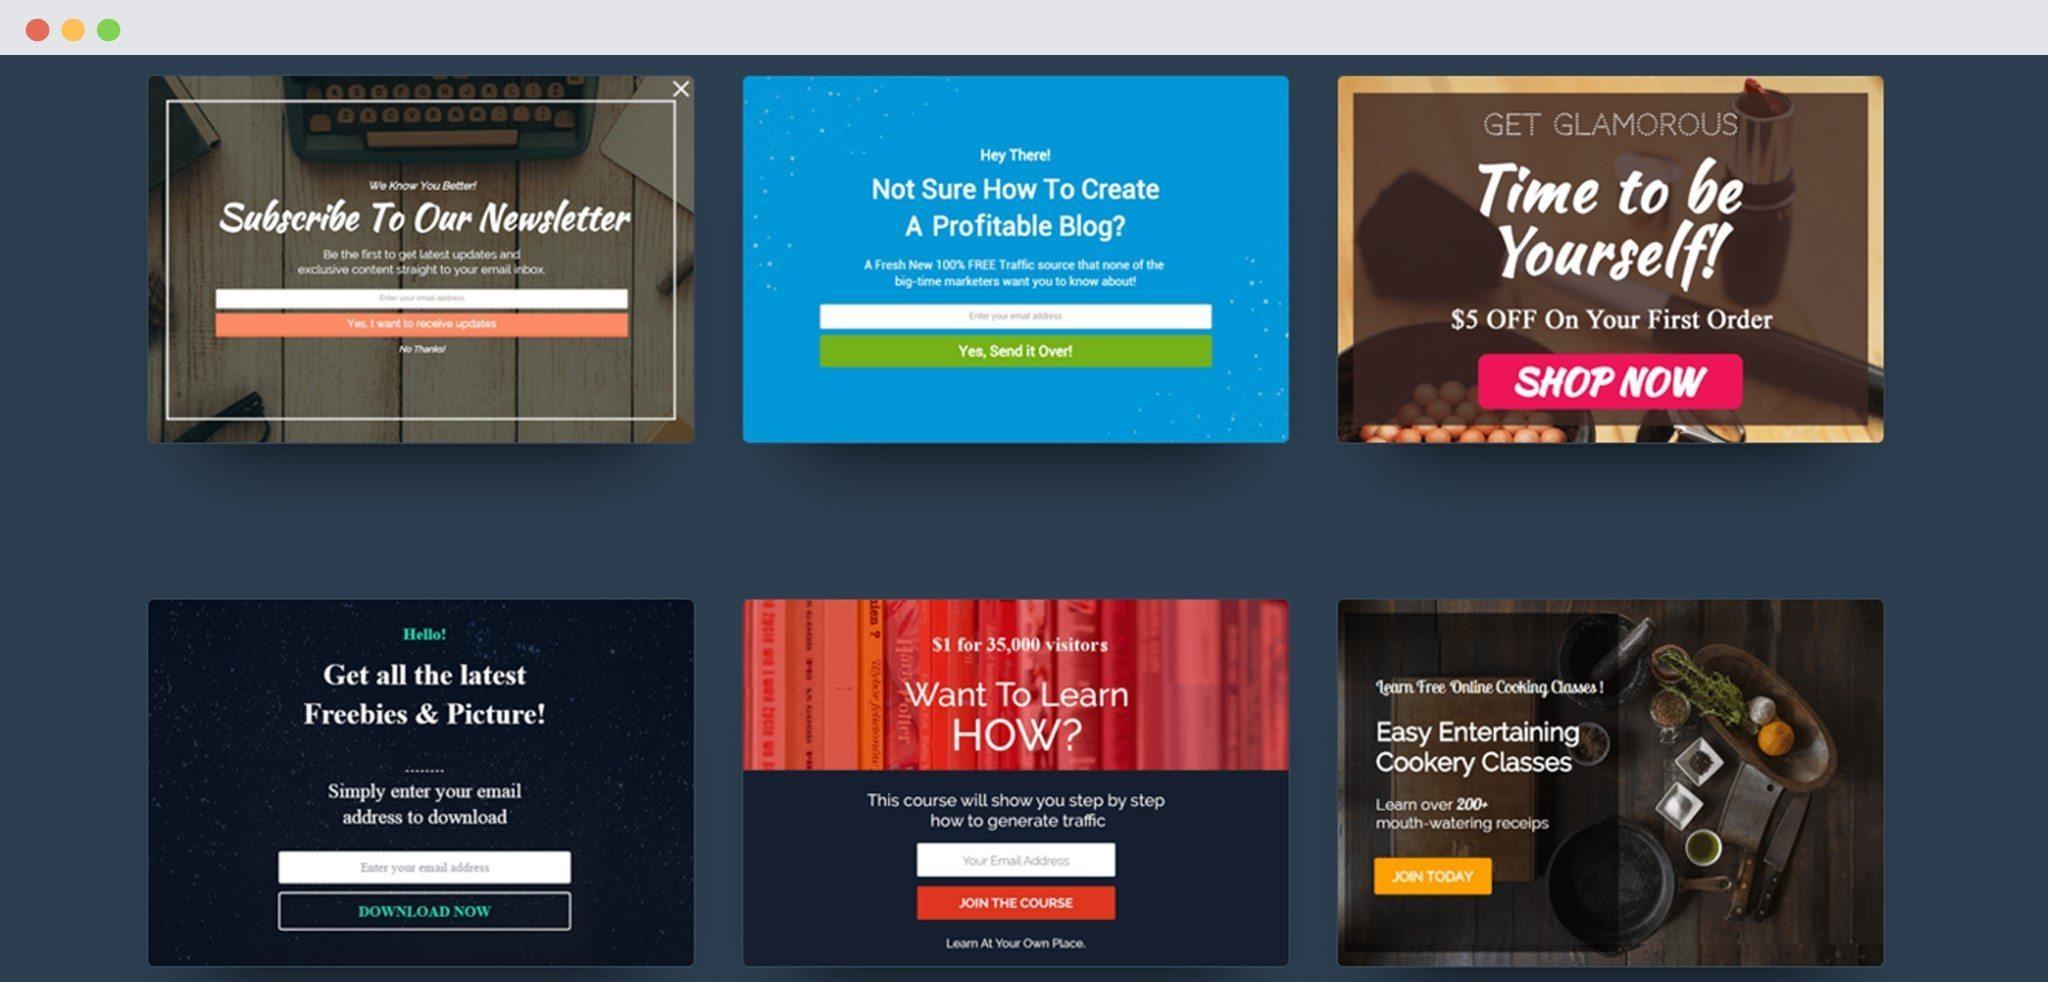 6 Best Lead Generation Plugins For WordPress (With Tutorials) WordPress  plugins List building Email marketing